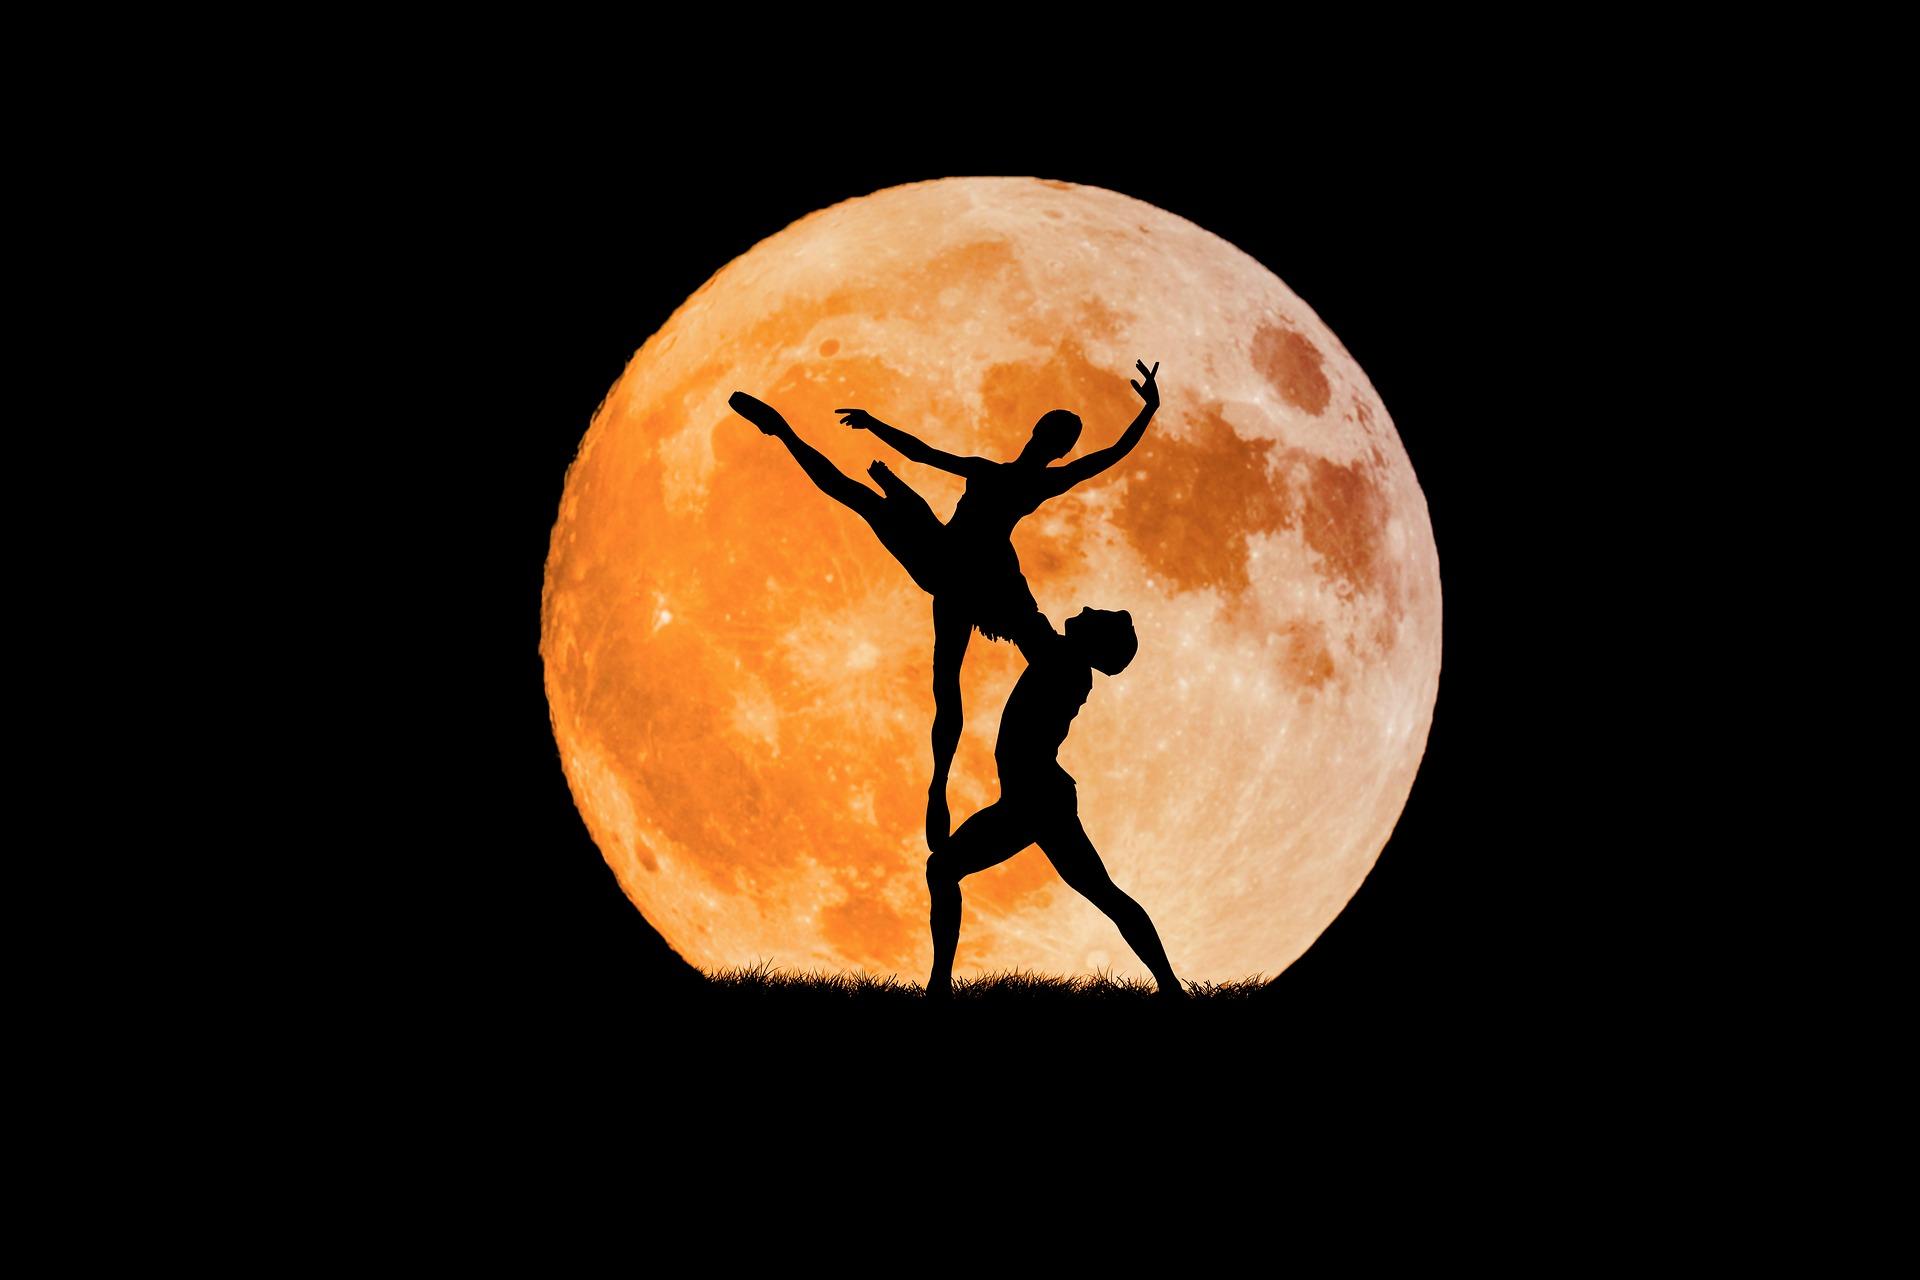 horoscop dragoste - sfatulparintilor.ro - pixabay- com - dancing-couple-3156089_1920